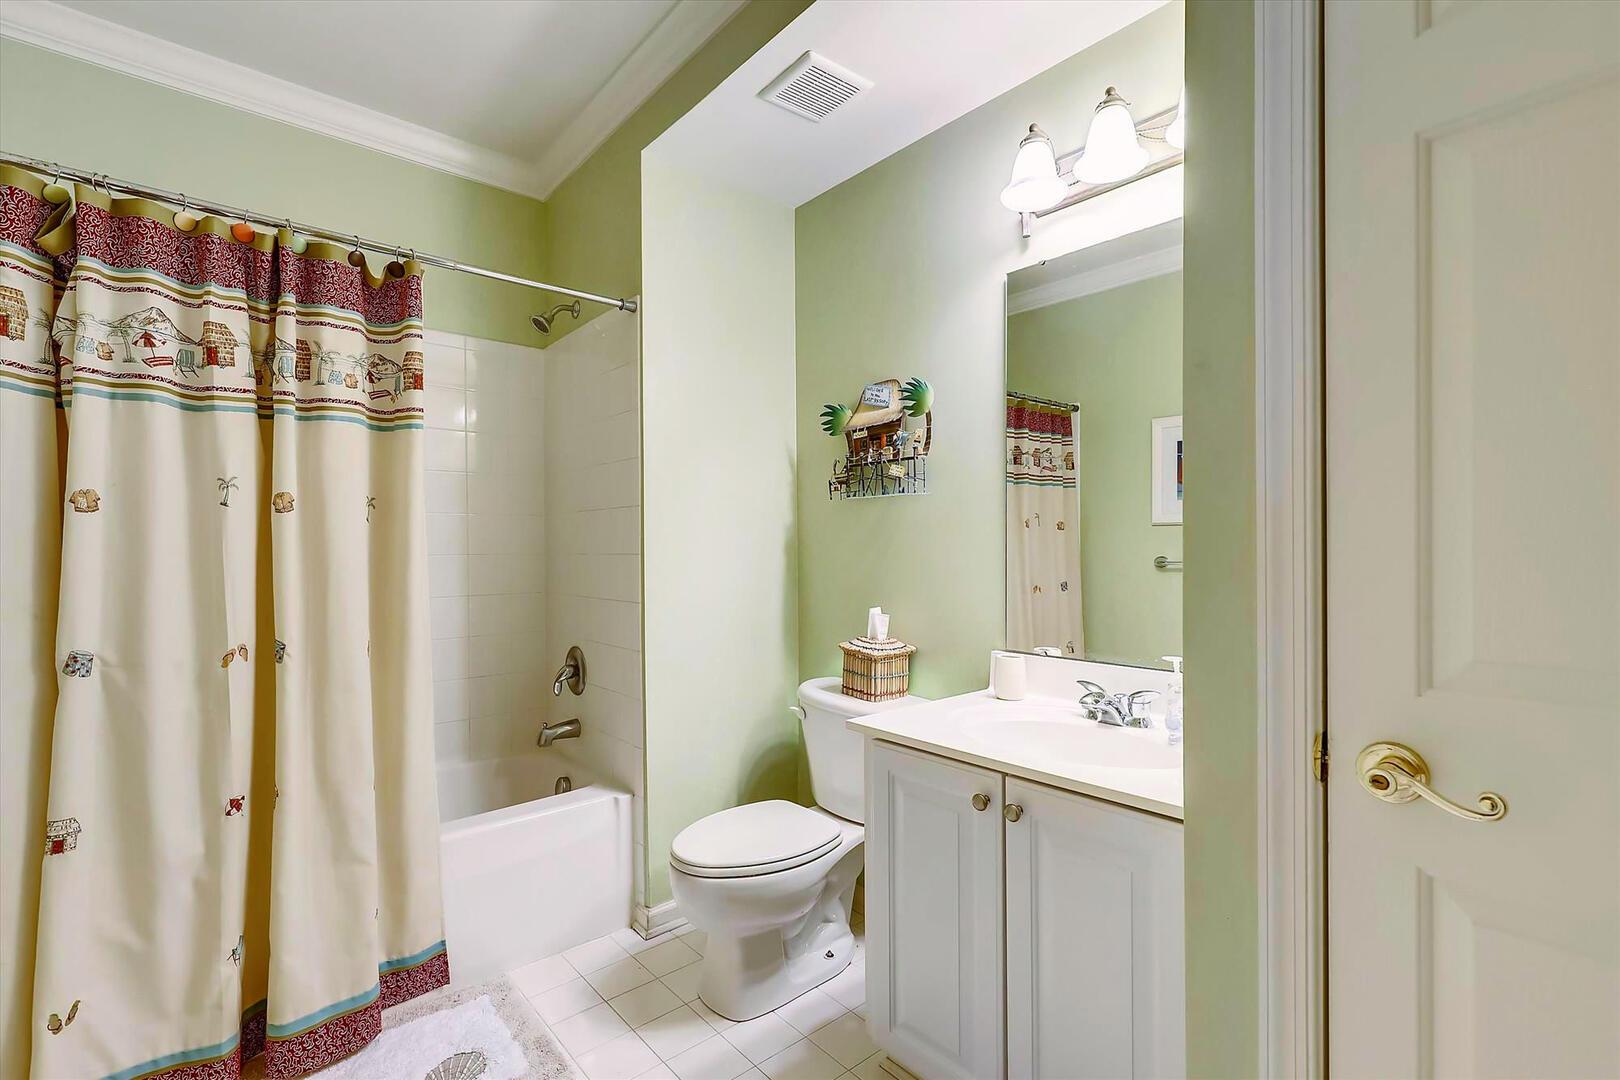 Hall Bathroom of 37 Fountain Dr. W 3C in Sunset Island